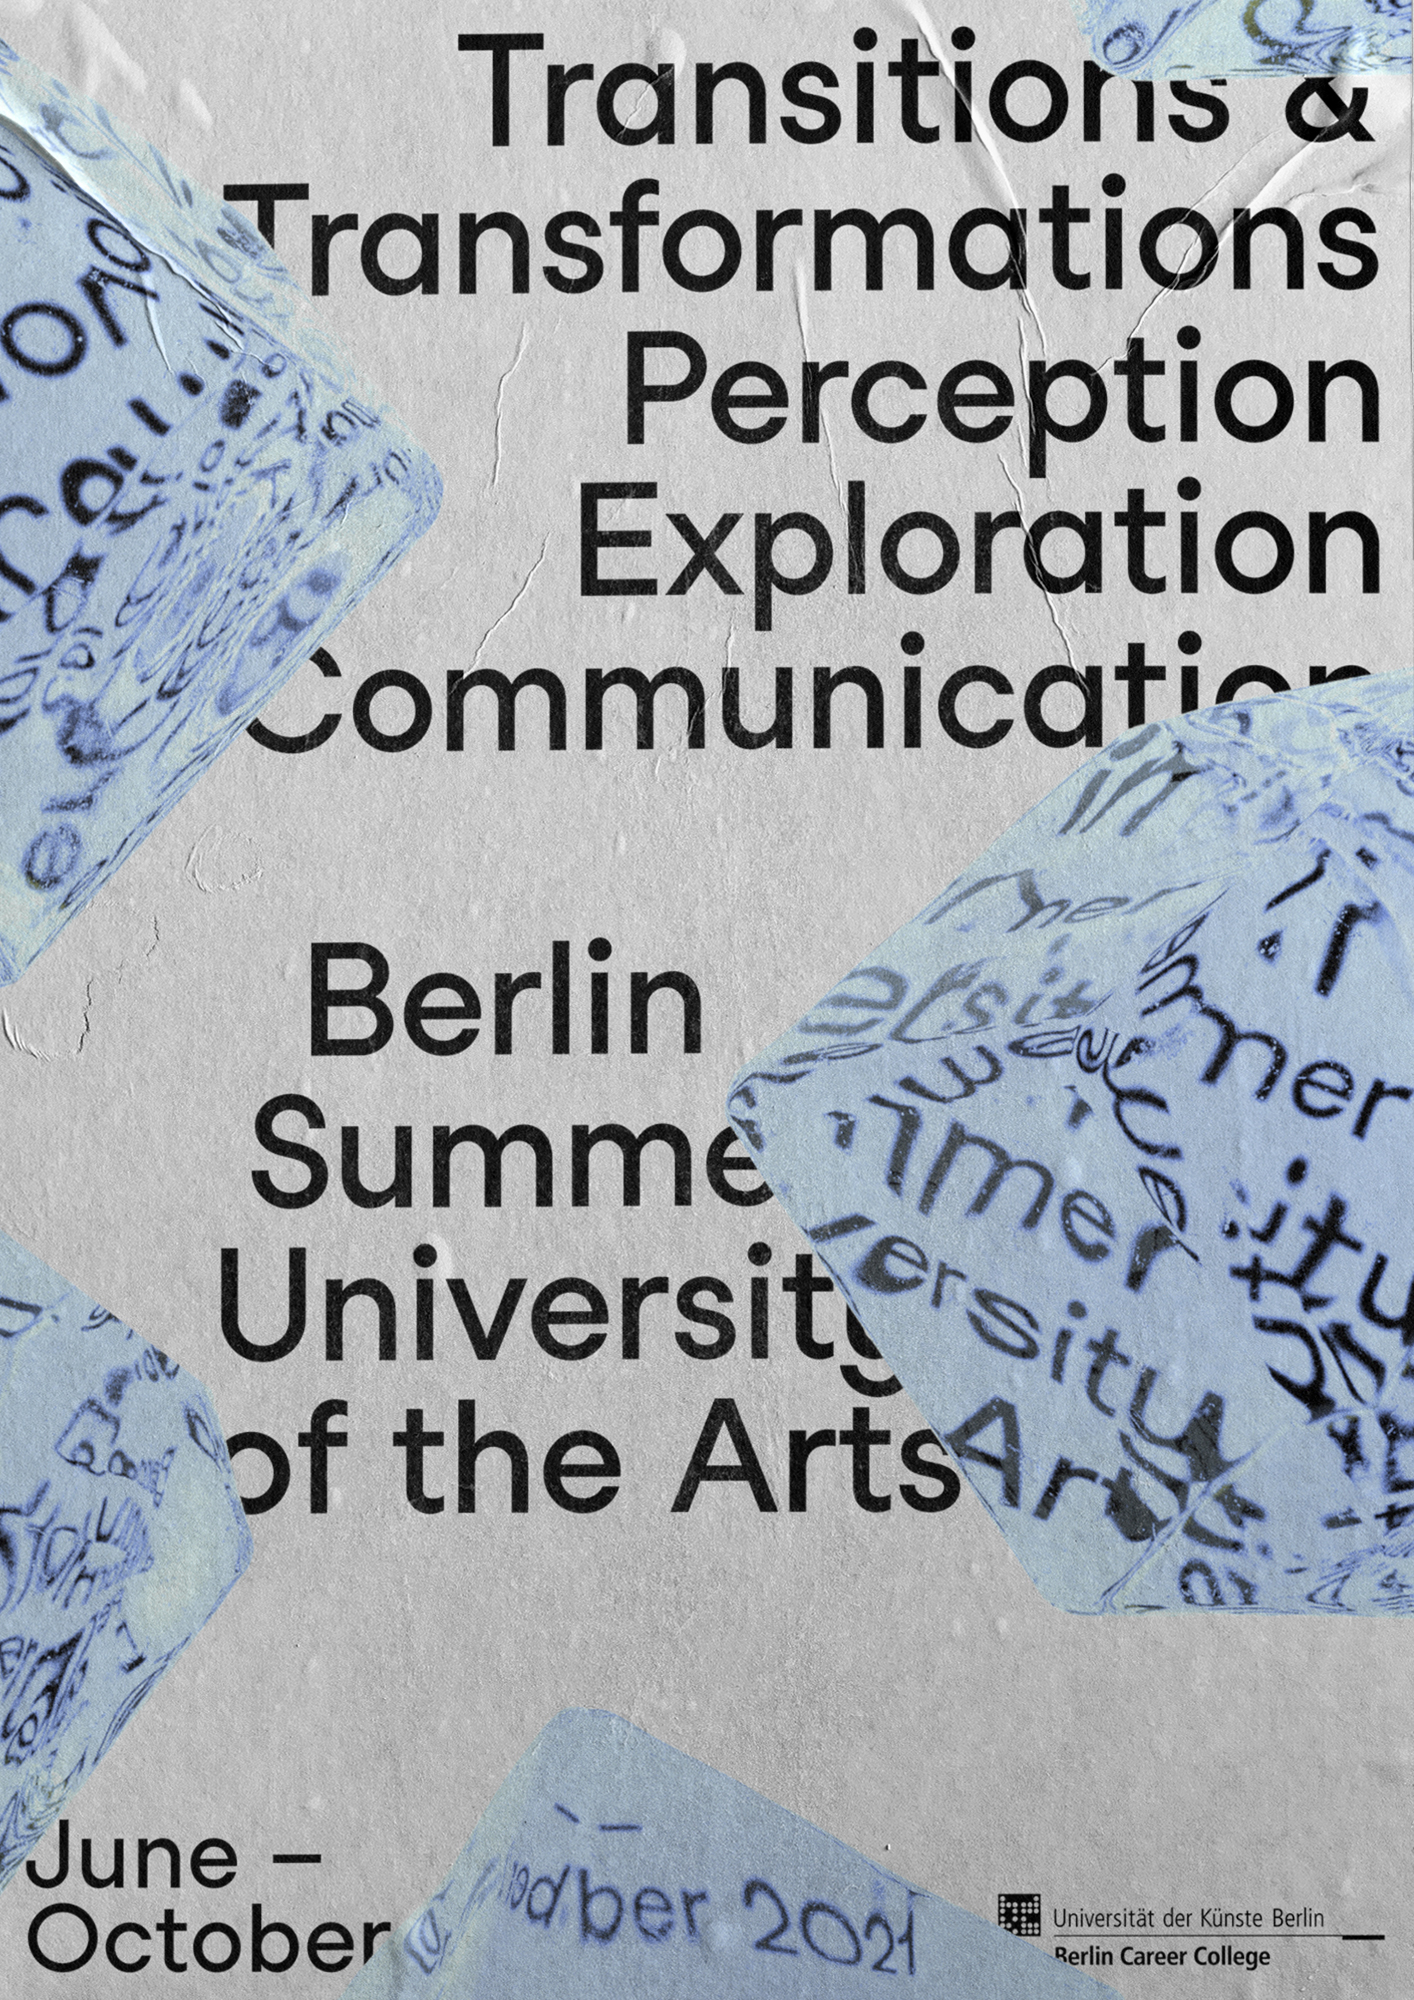 Tobias-Raschbacher-Berlin-Summer-University-Poster-Mockup-2